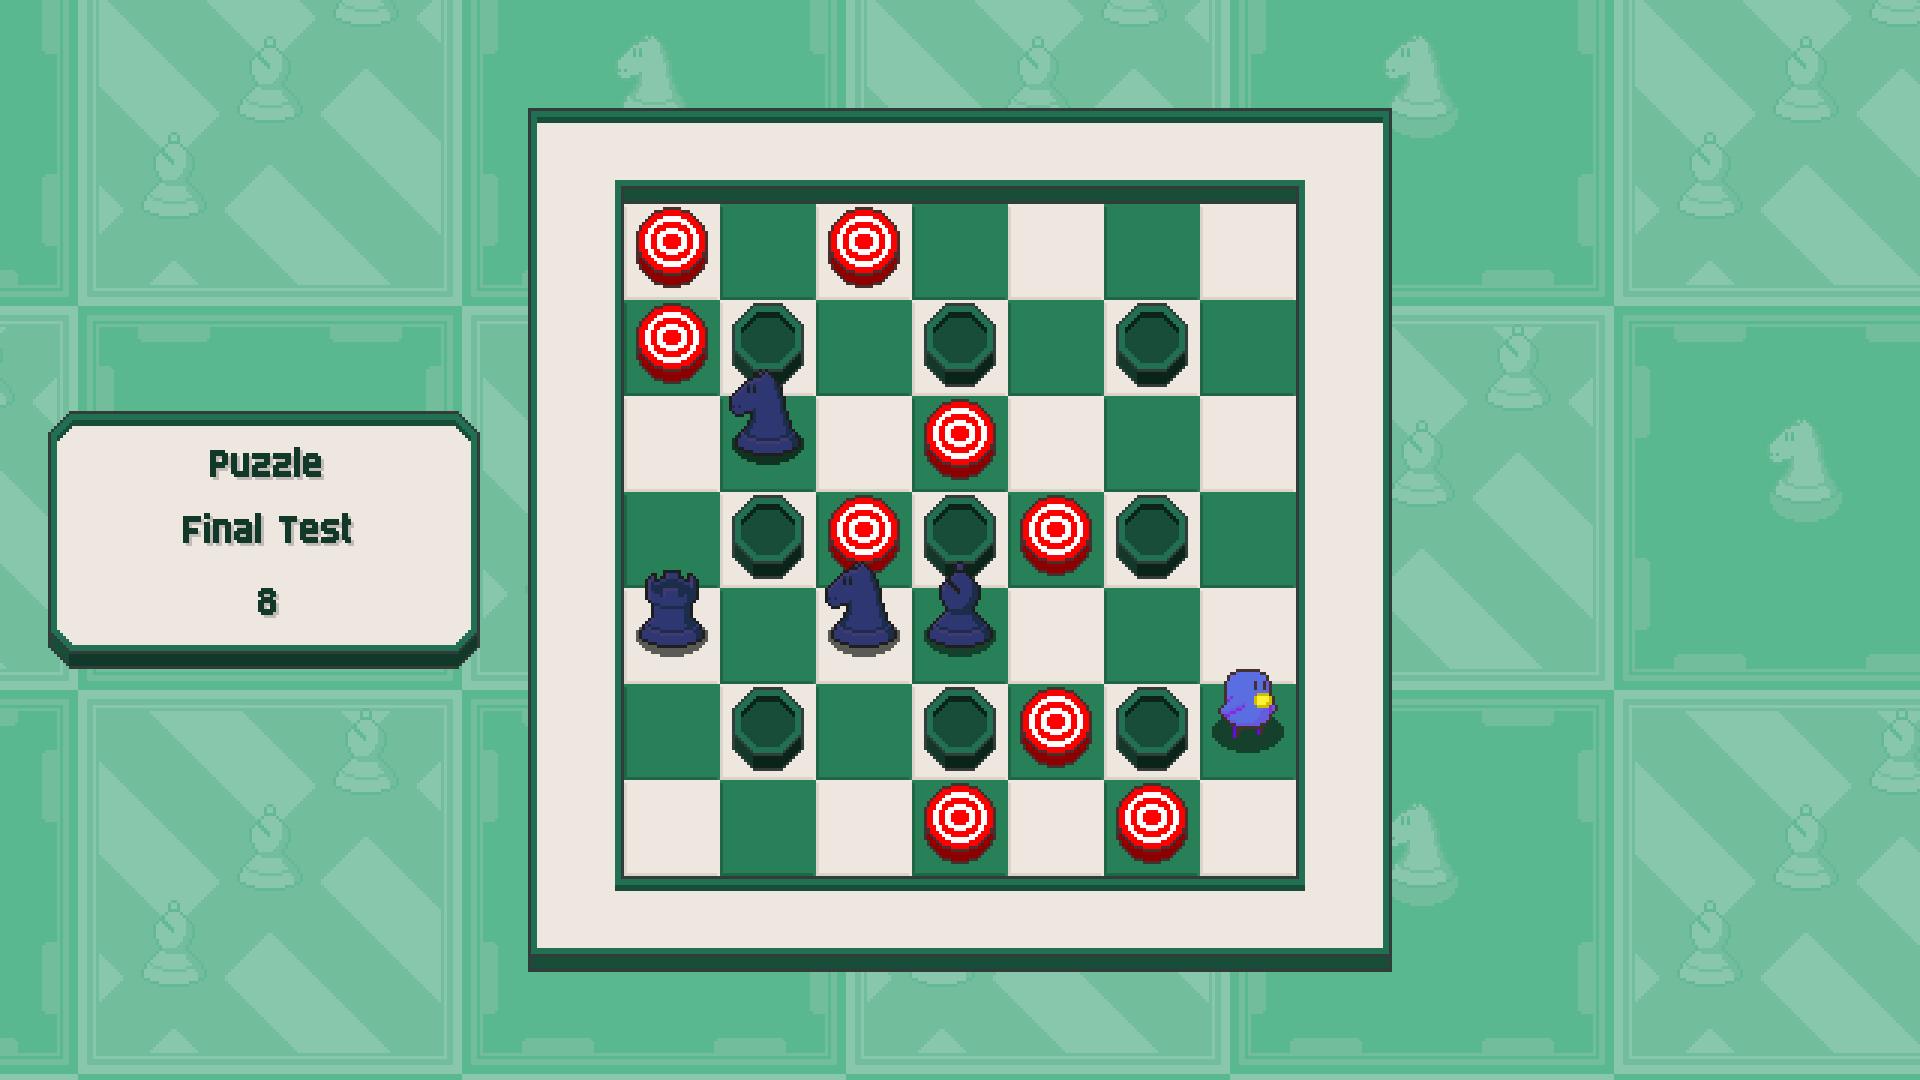 Chessplosion - Puzzle Solution Guide + Achievements Walkthrough - Grandblaster: Final Test - BE0CF0C